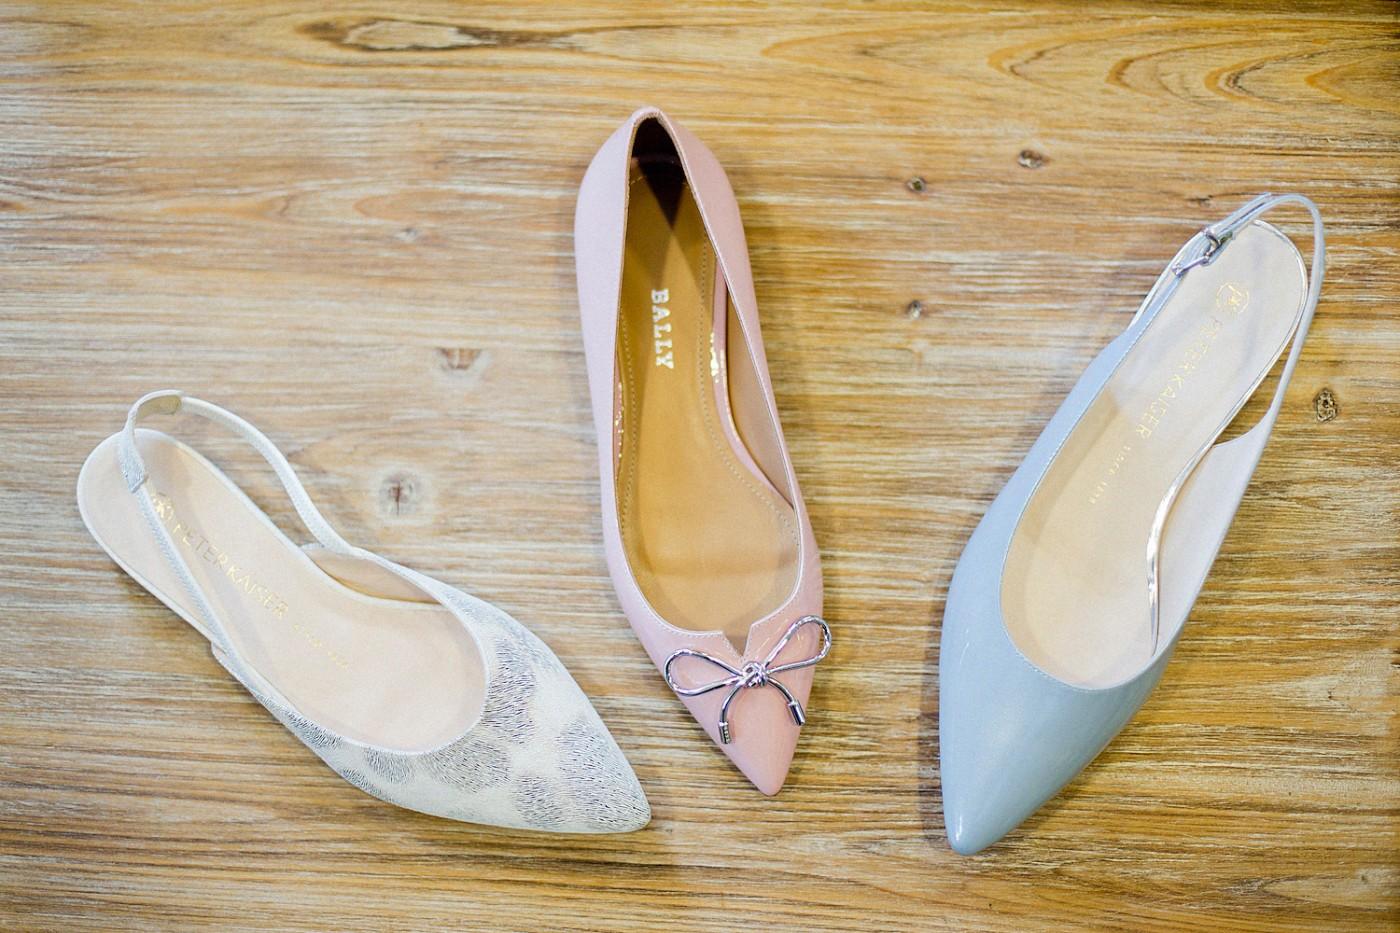 the secret of shoes ingolstadt village